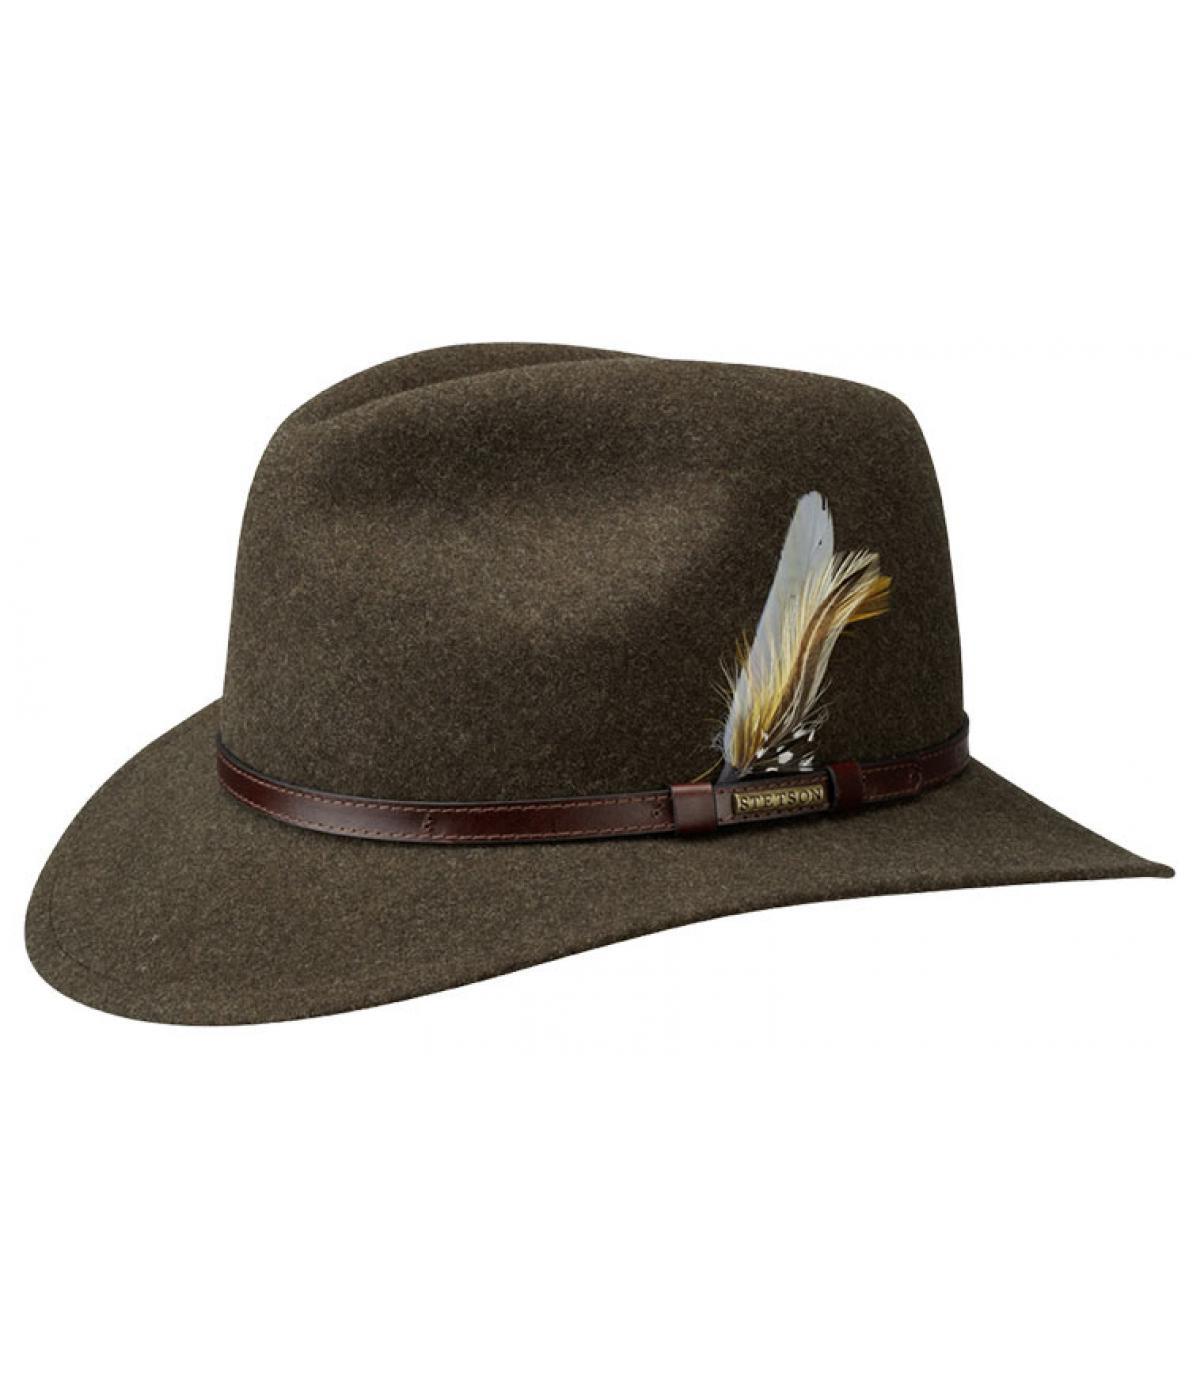 Sombrero feutre marrón Stetson